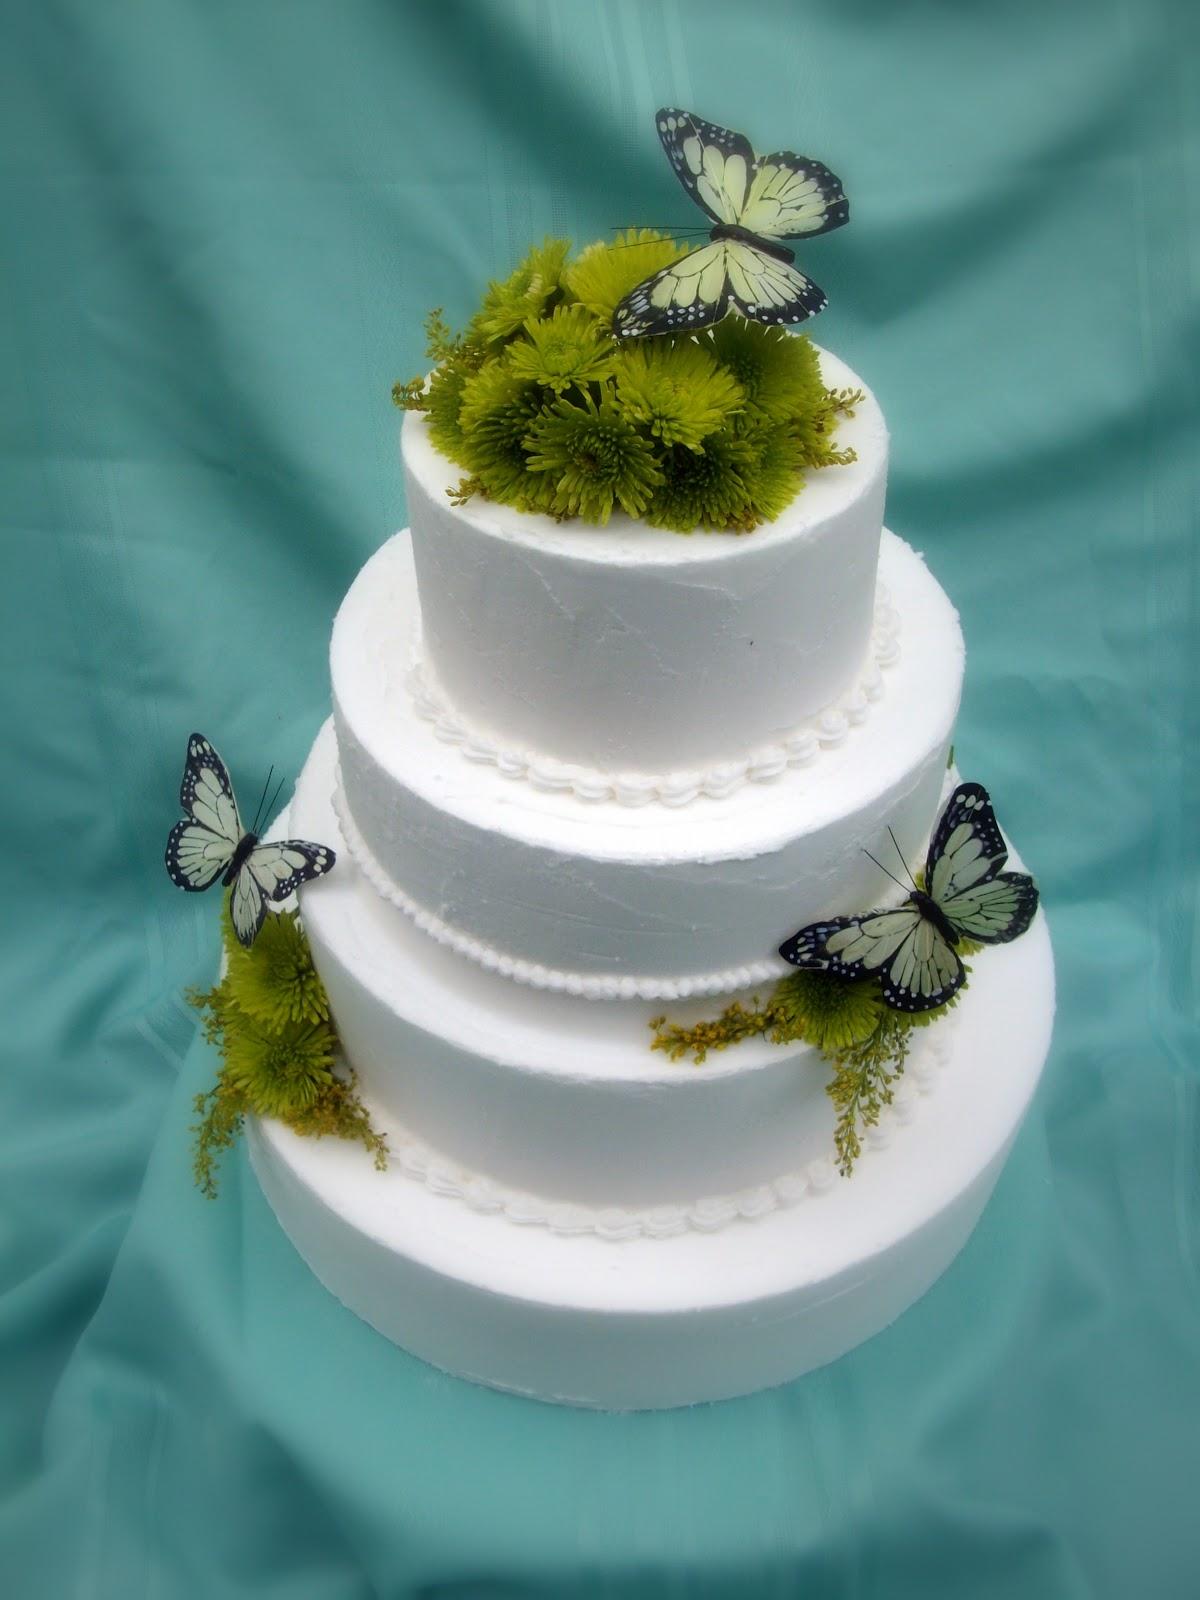 homemade wedding cake